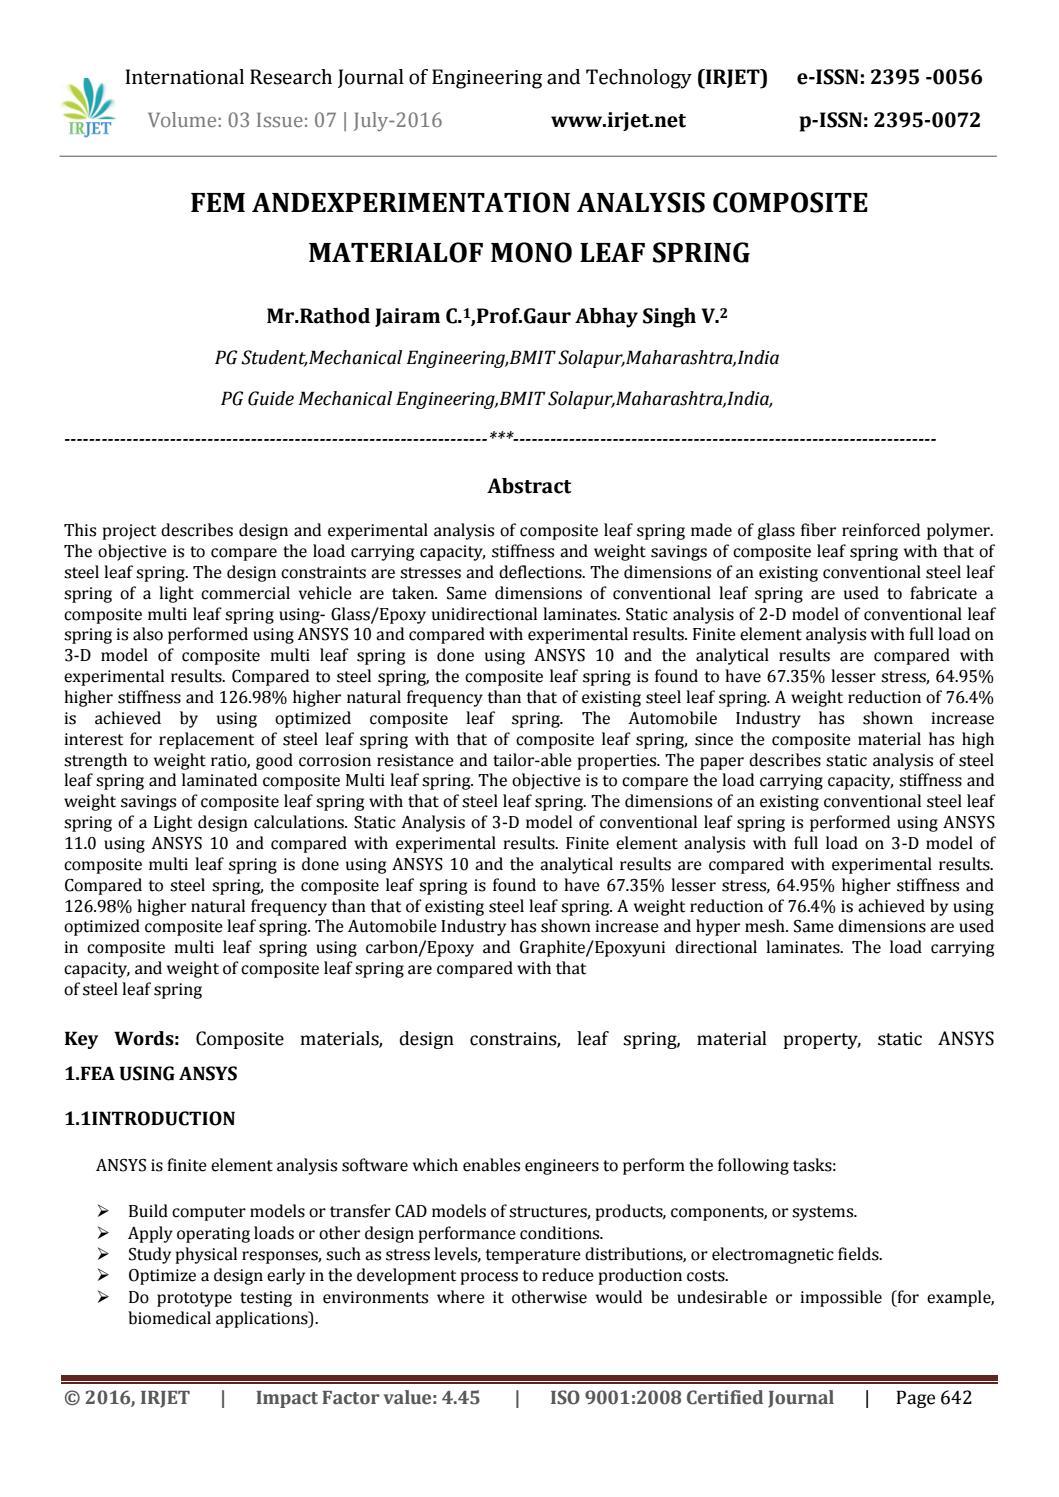 IRJET-Fem and Experimentation Analysis Composite Material of Mono